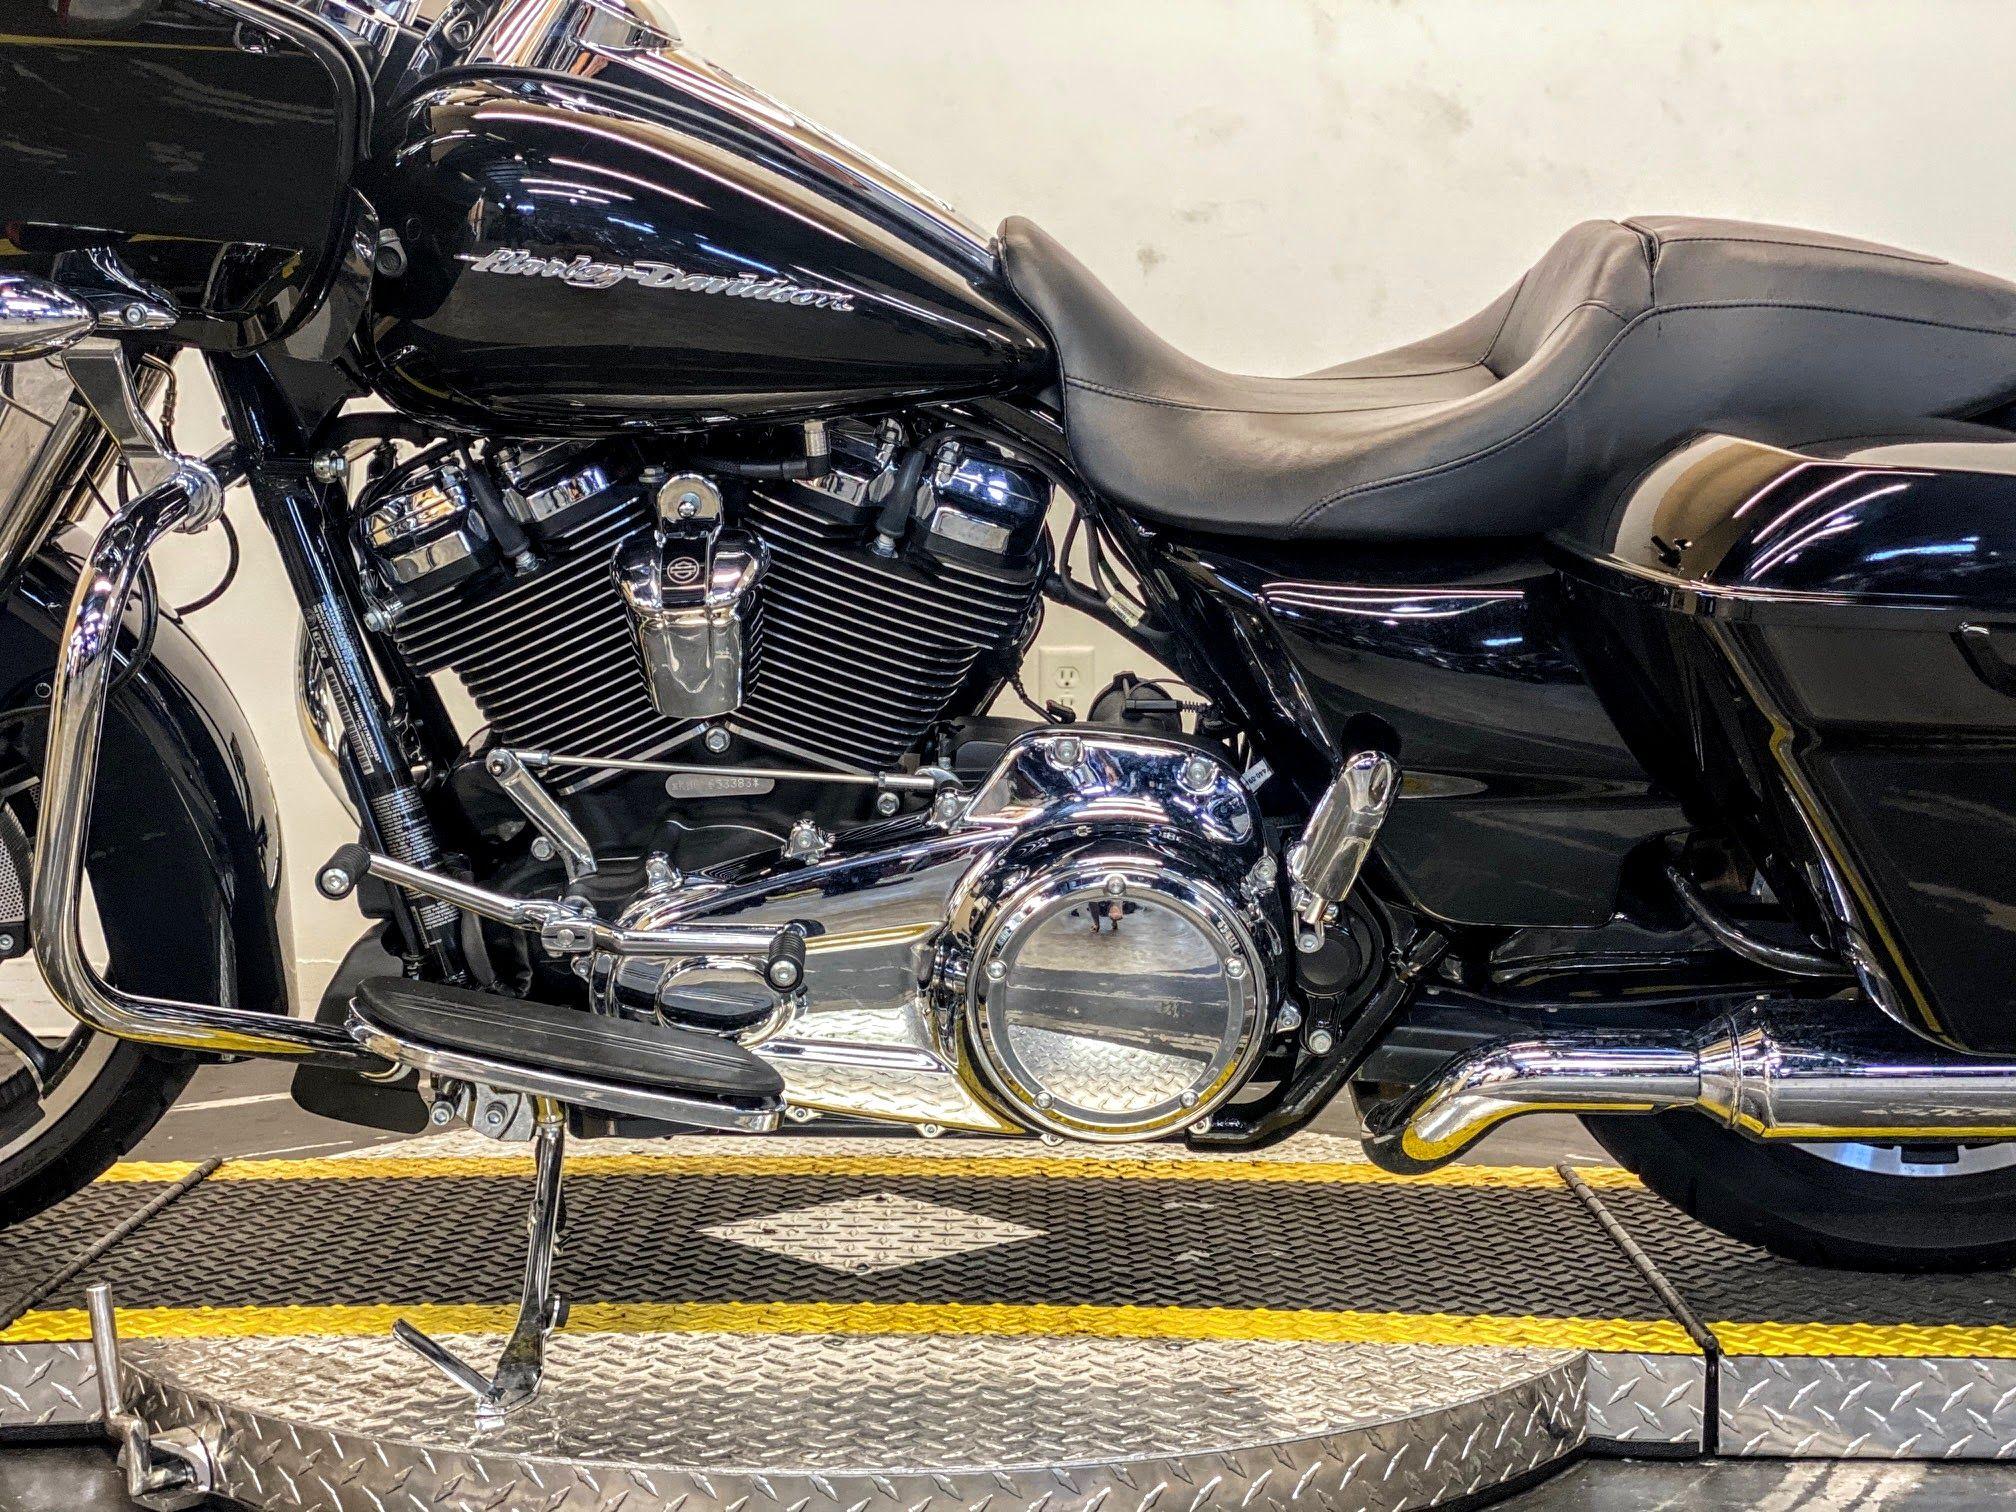 Certified Pre-Owned 2019 Harley-Davidson Road Glide FLTRX